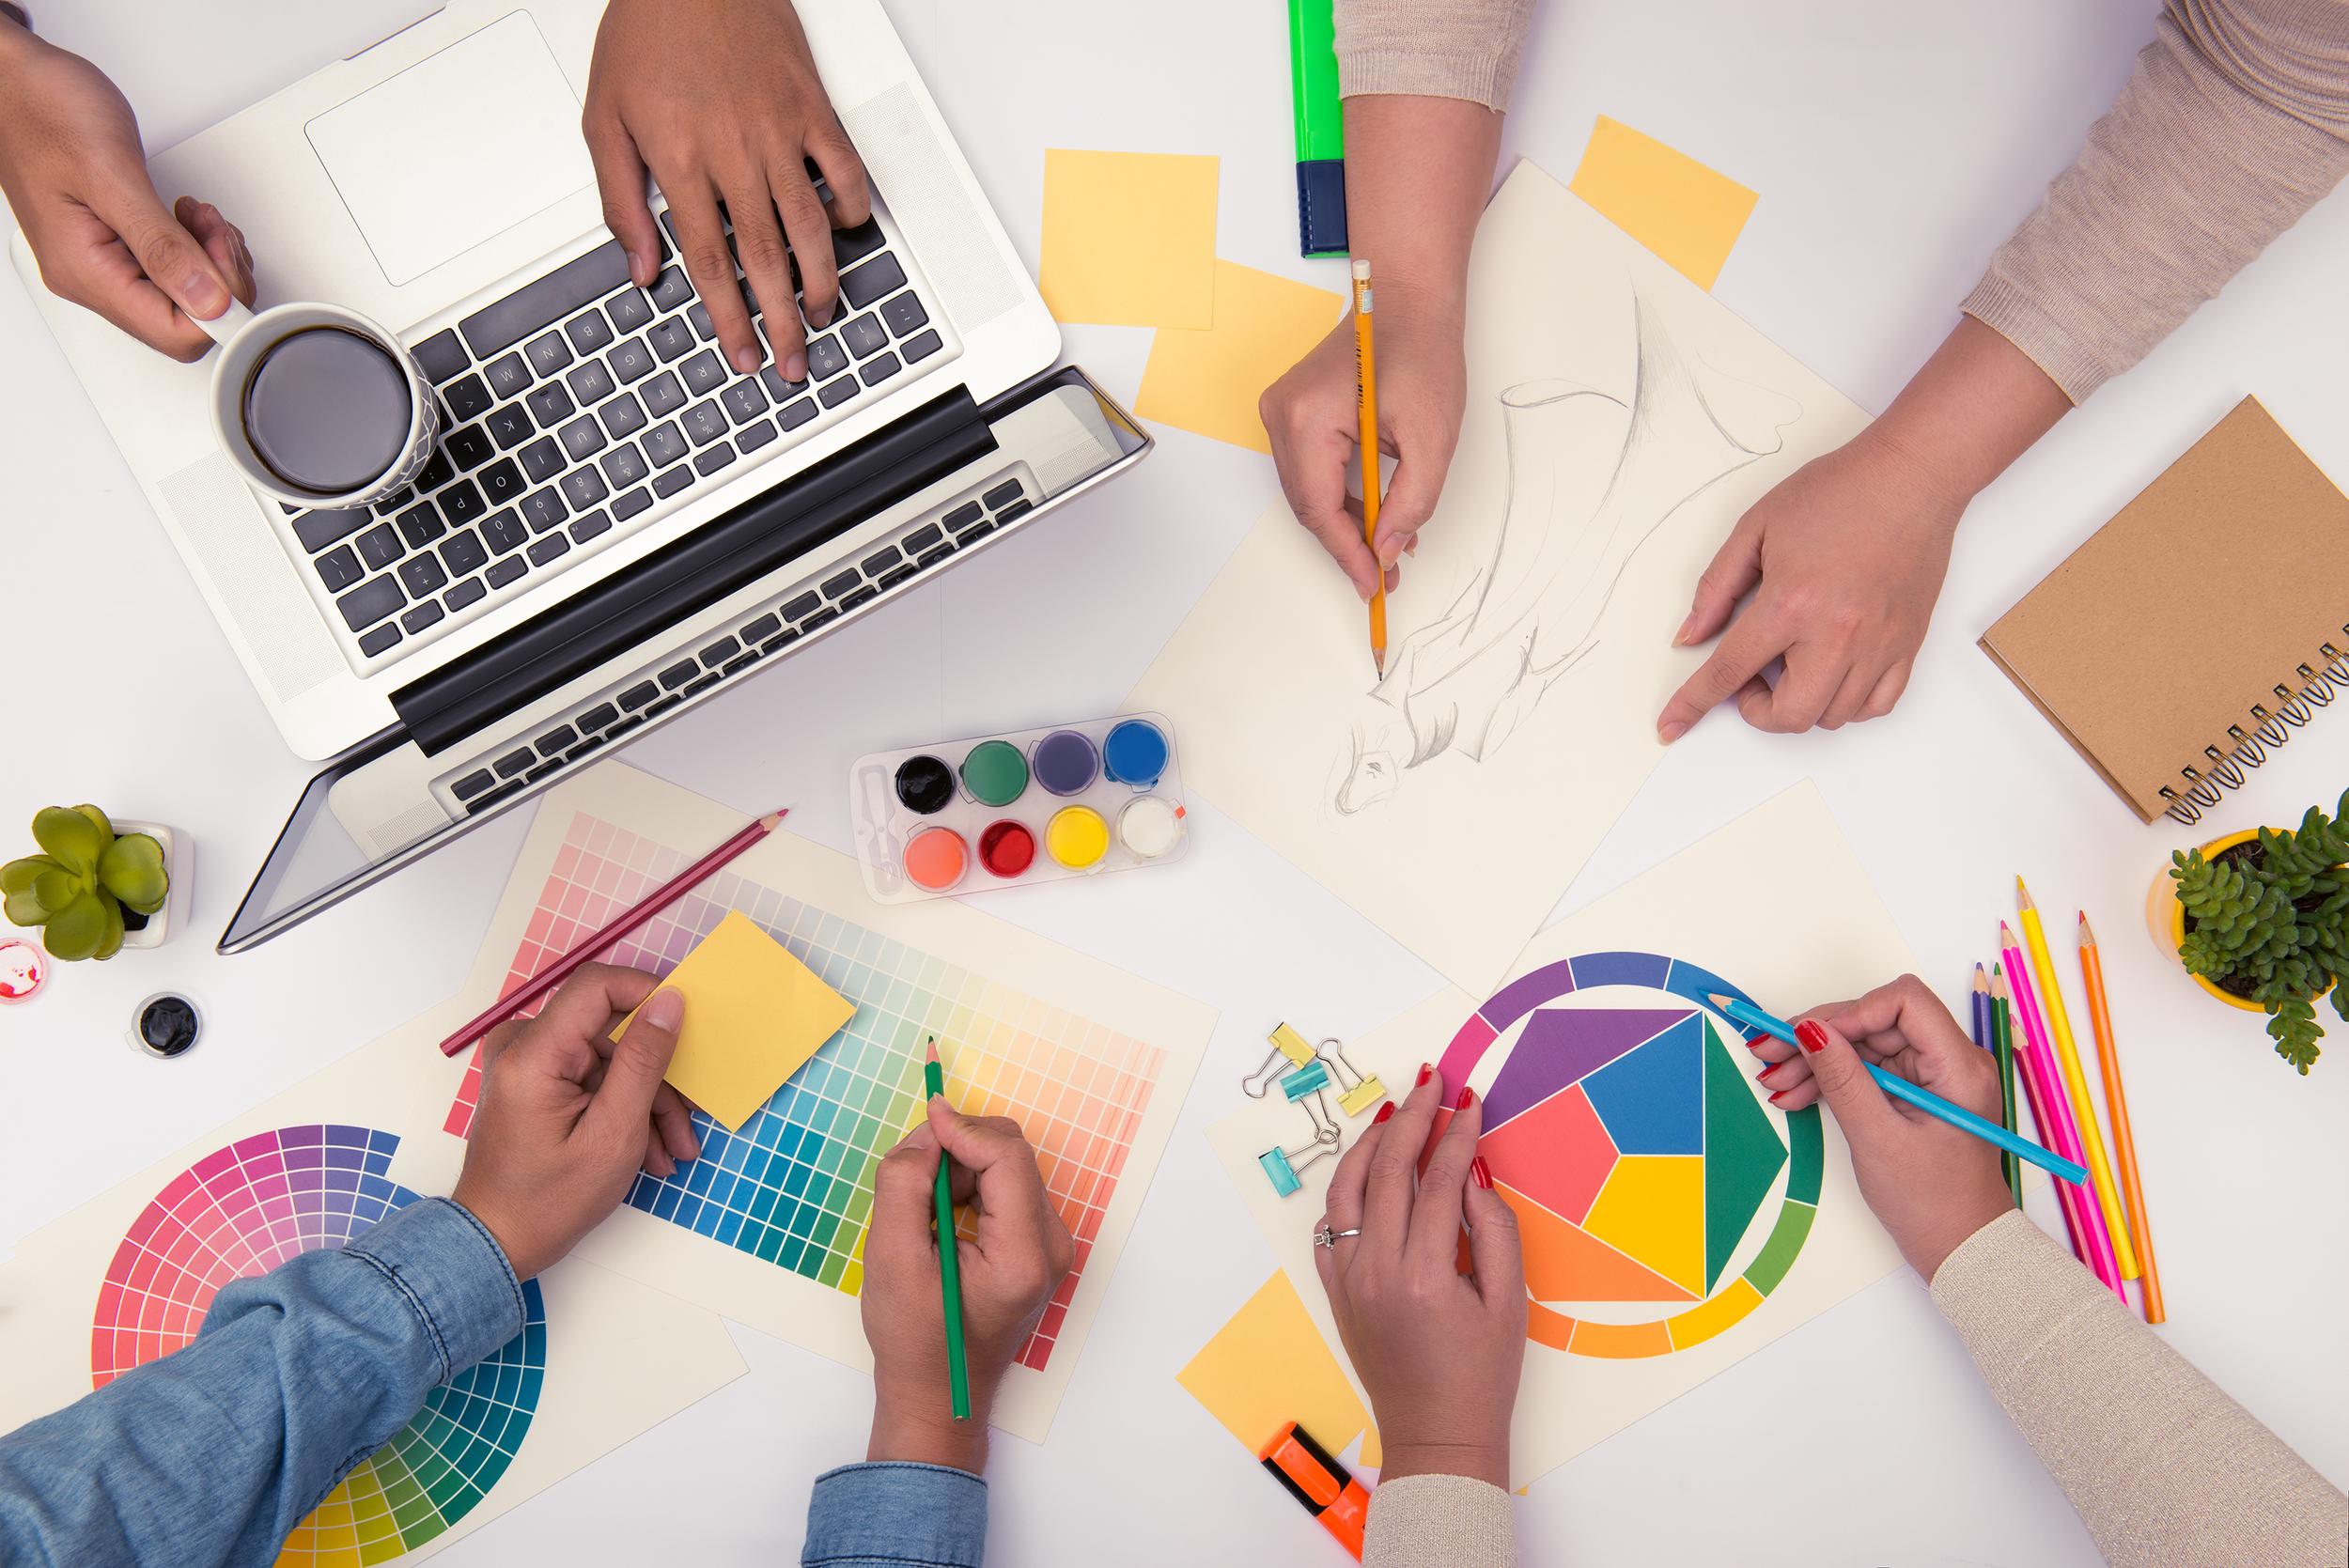 Conceptofdesignerteamworkbrainstormingplanningmeeting(1).png